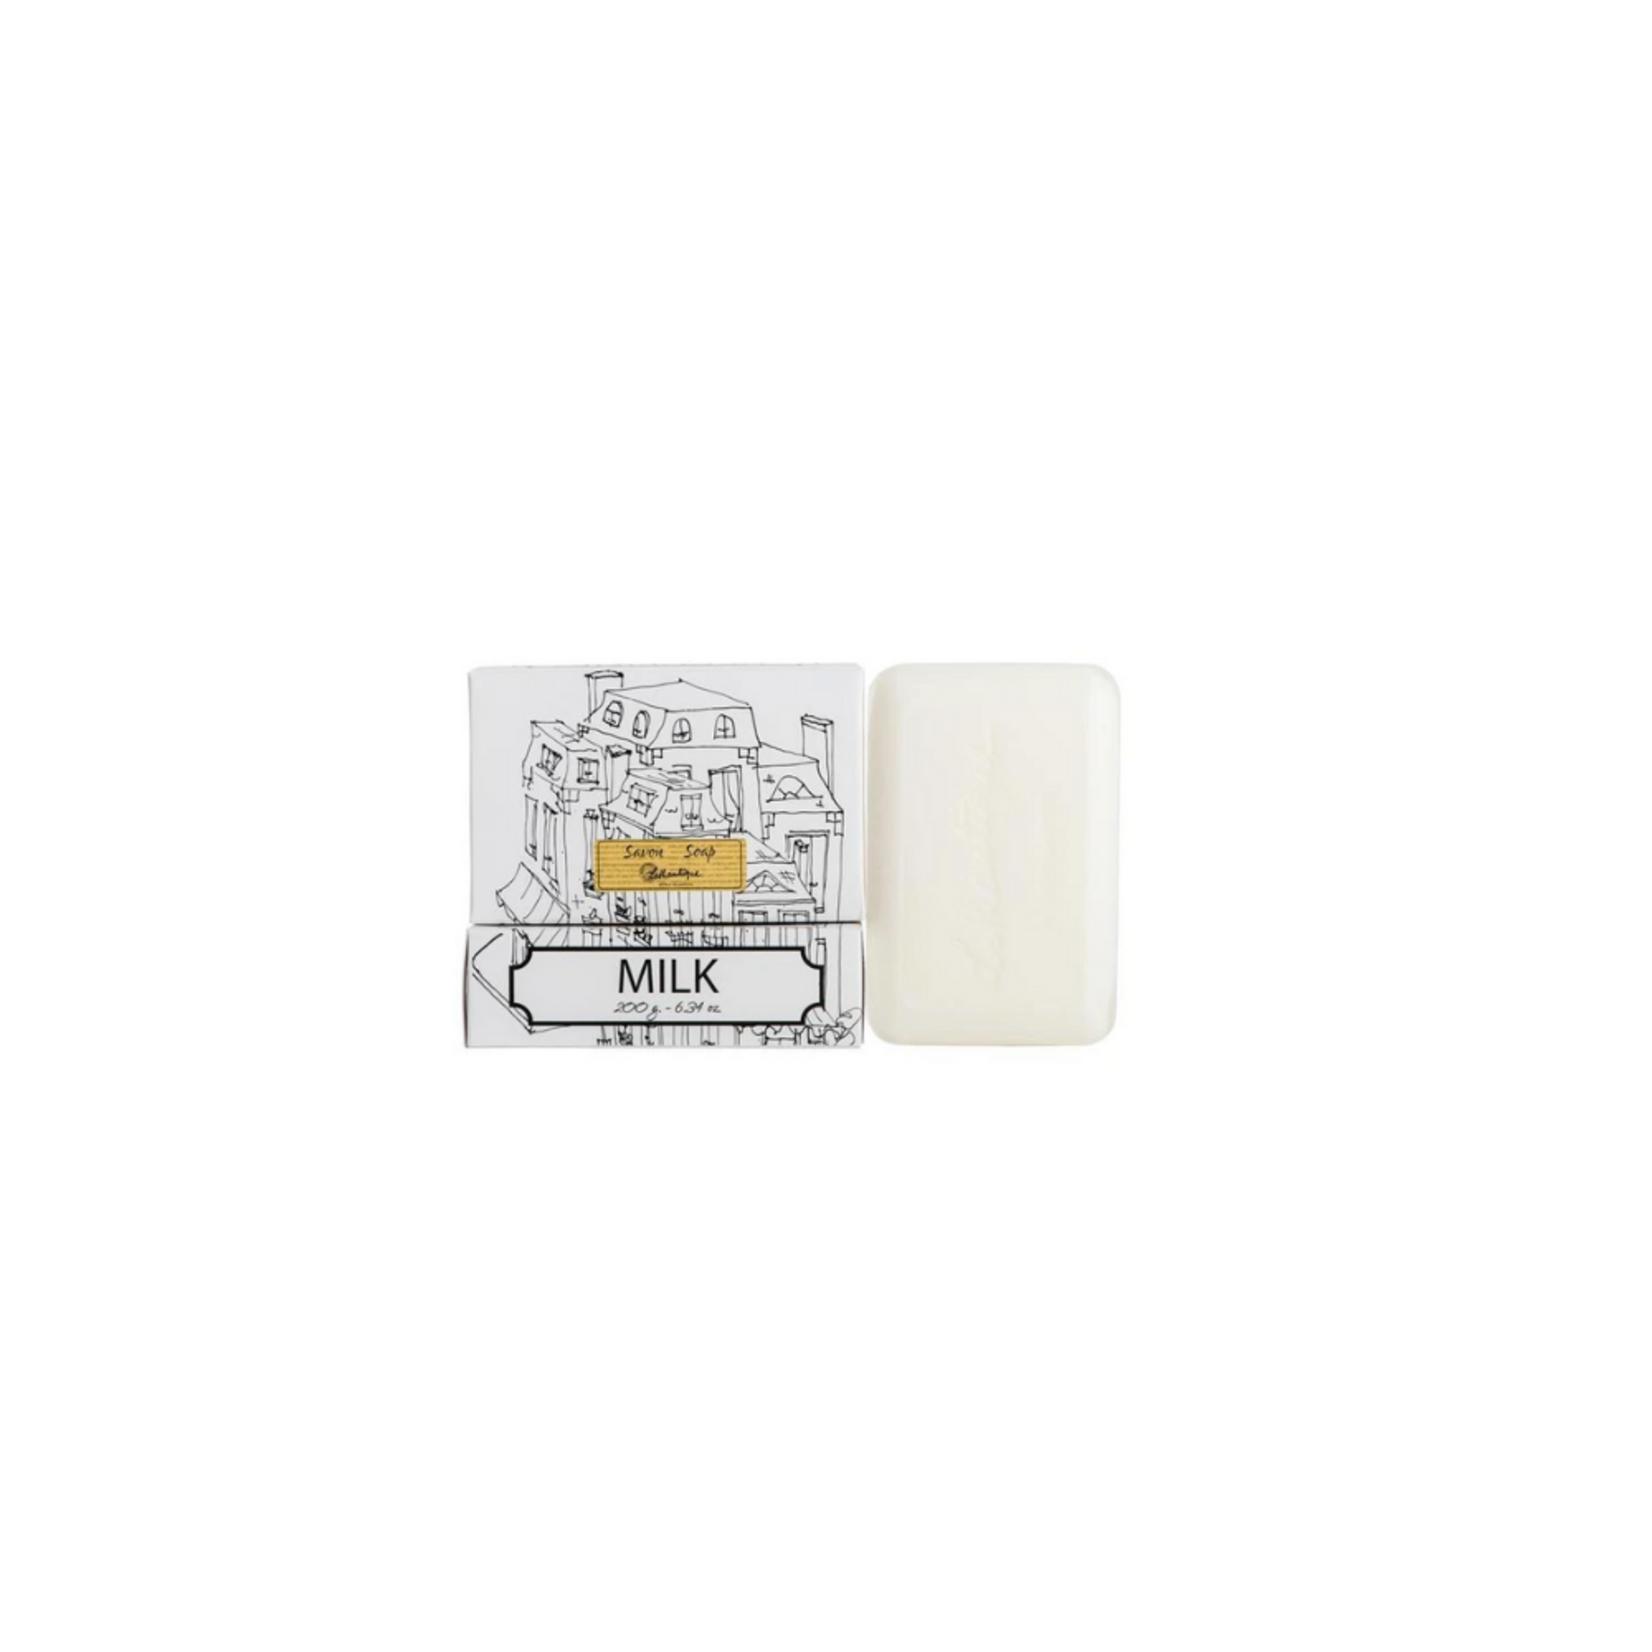 Milk, 200g Bar Soap